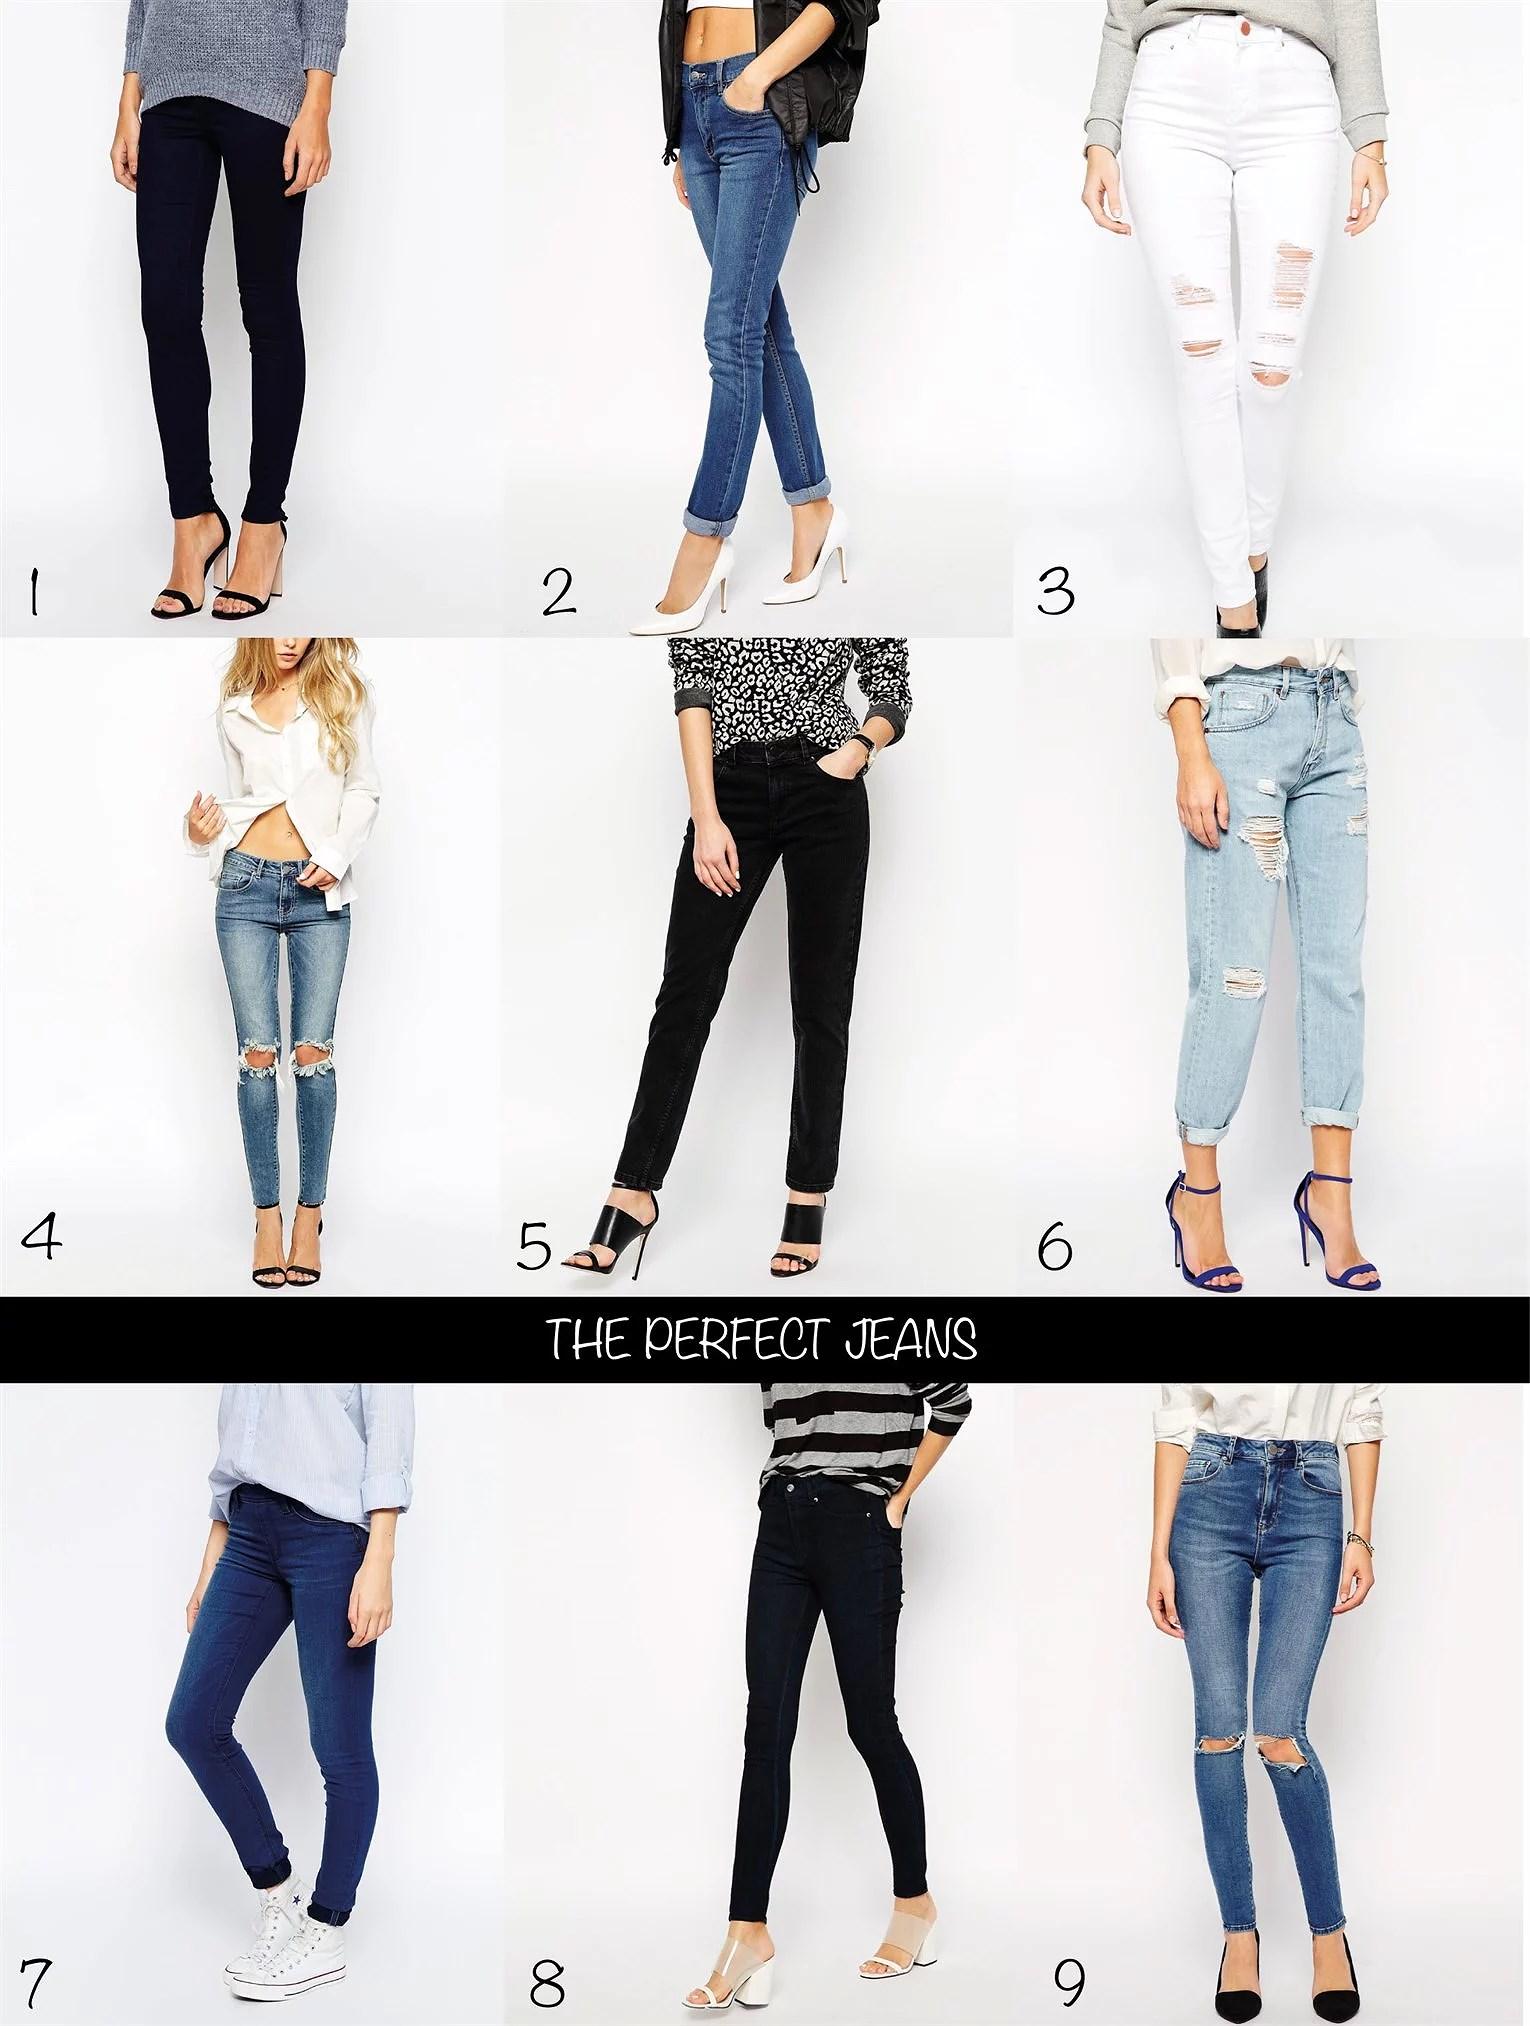 Jeans, Mode, Modeblogger, Julie Mænnchen, It's My Passions, Asos, Gode jeans, Aalborg blogger